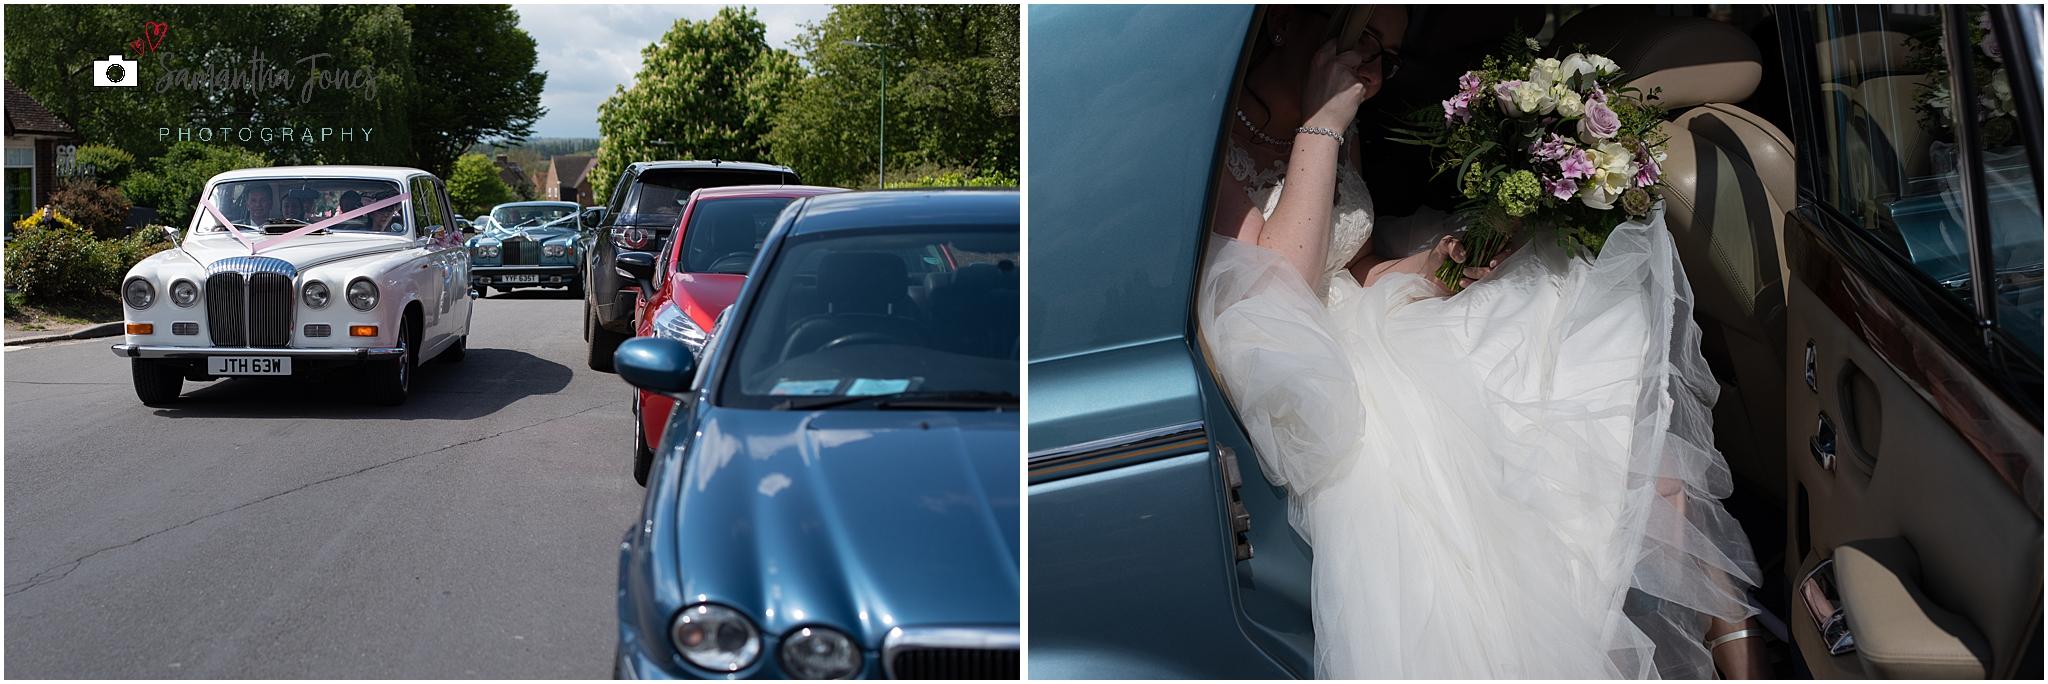 bride arrival at church